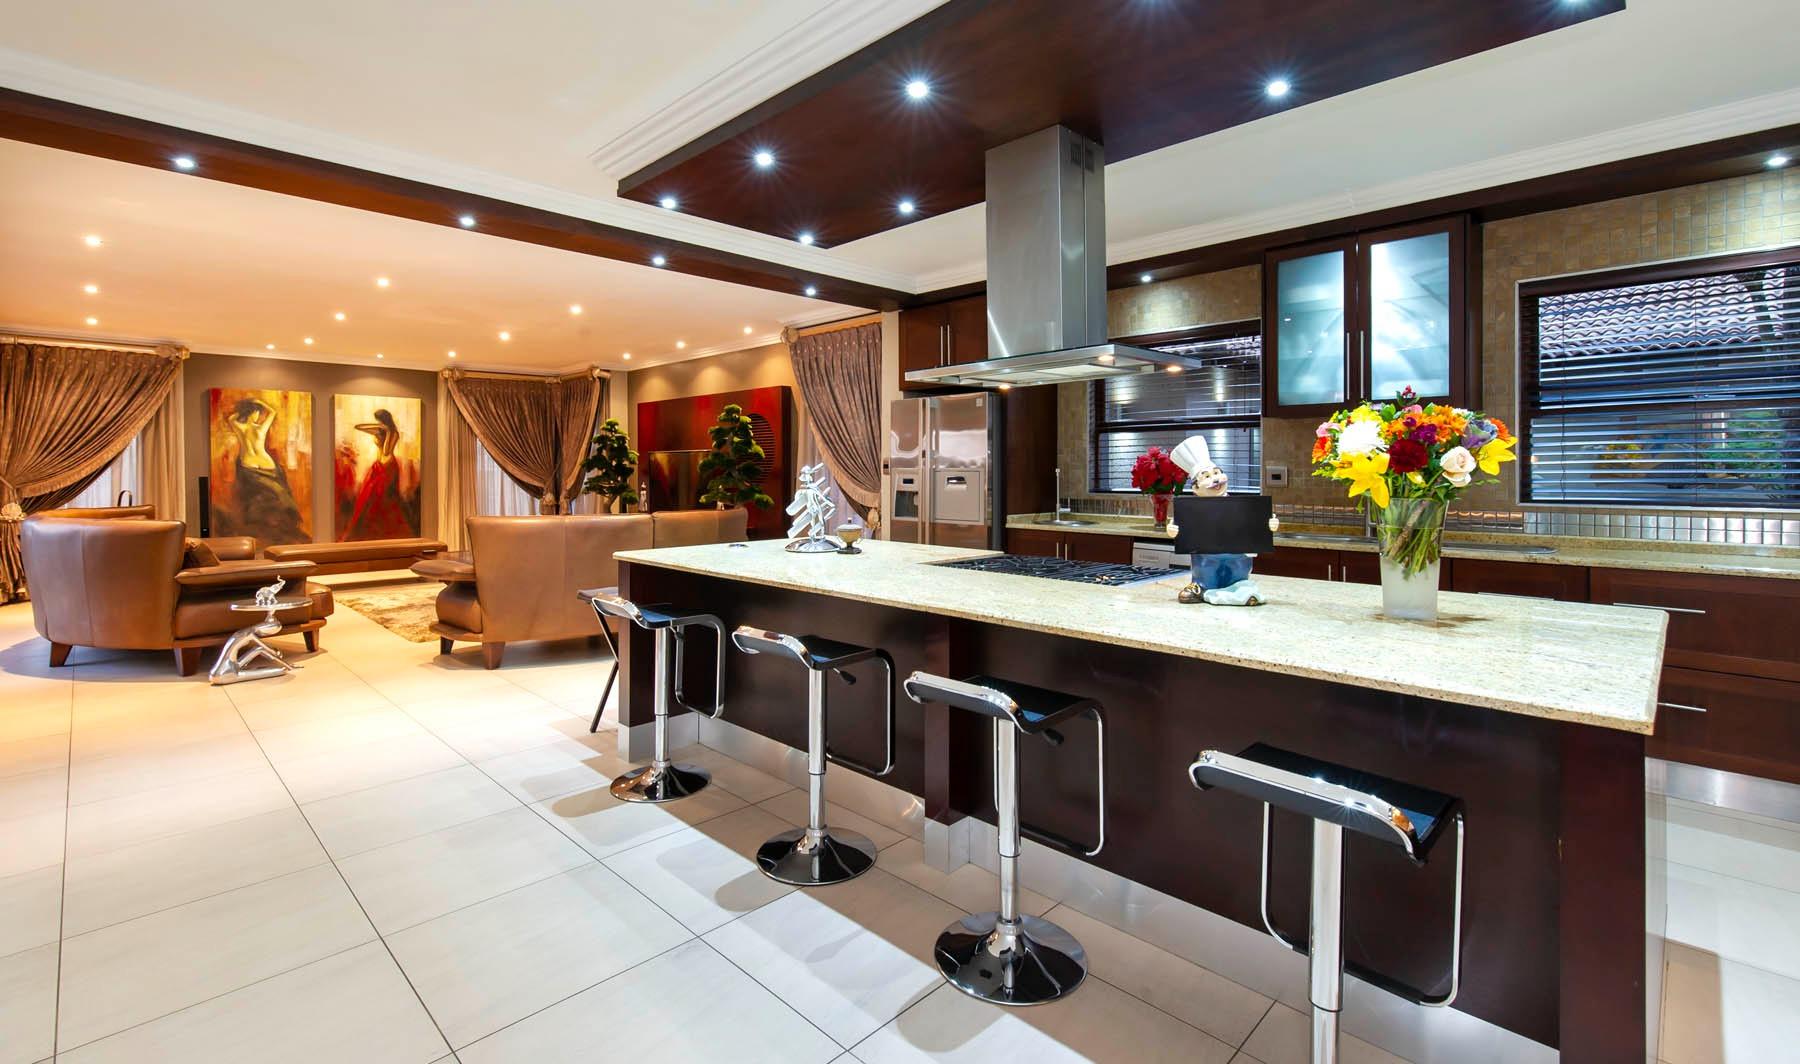 6 Bedroom House For Sale in Bedfordview